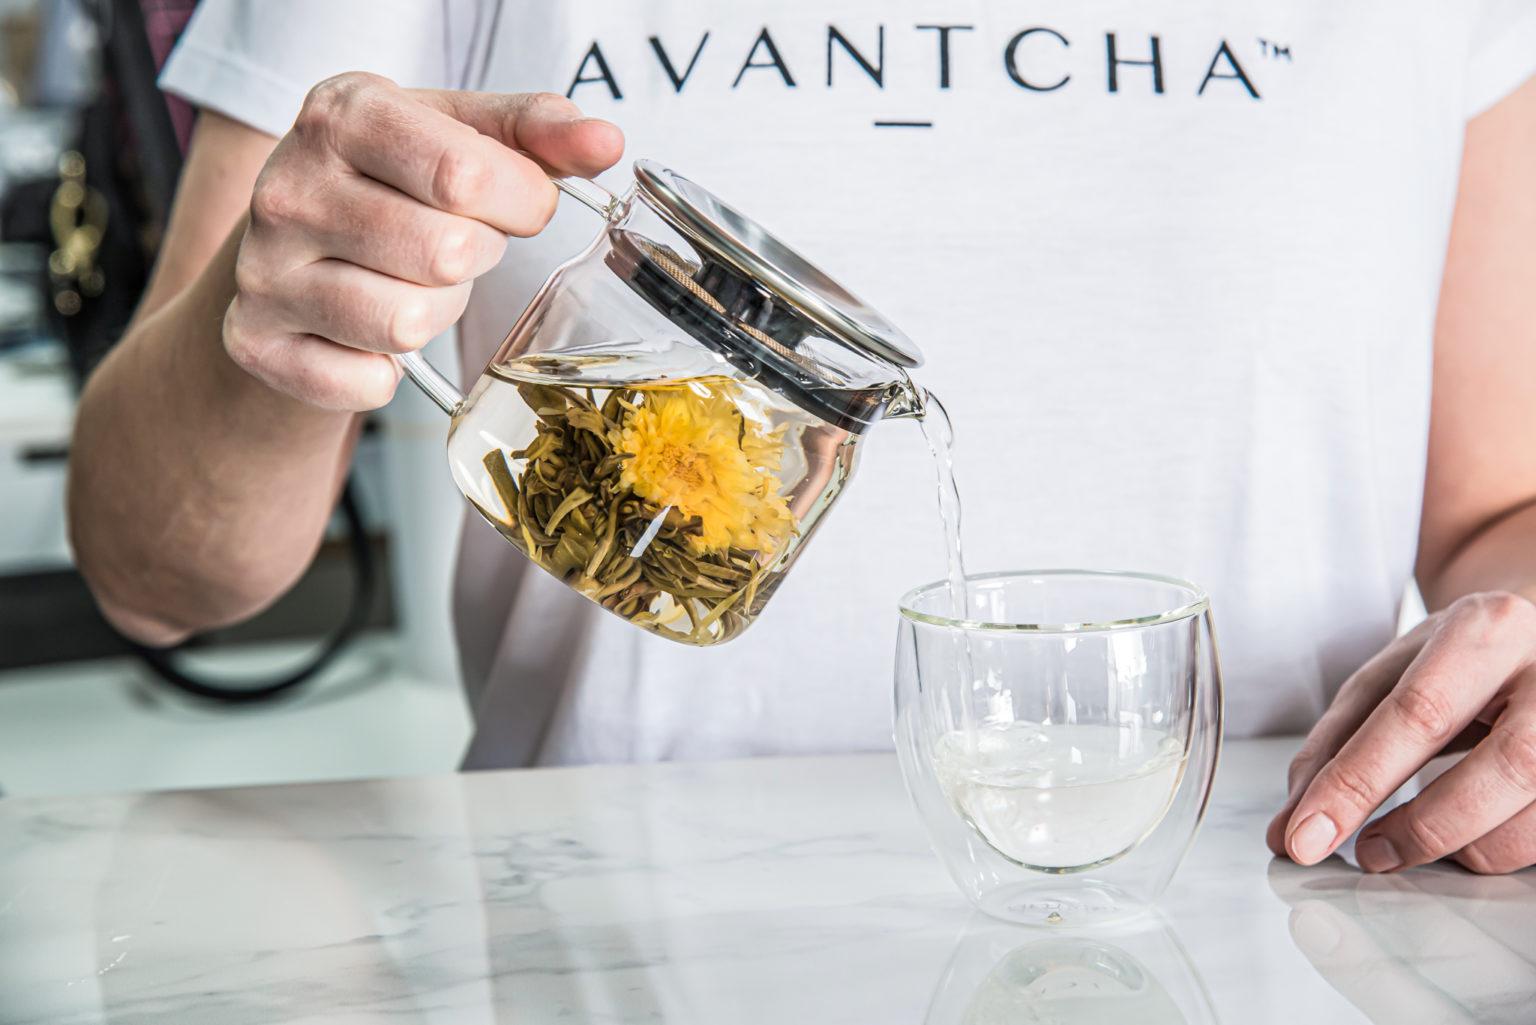 AVANTCHA Blooming Tea